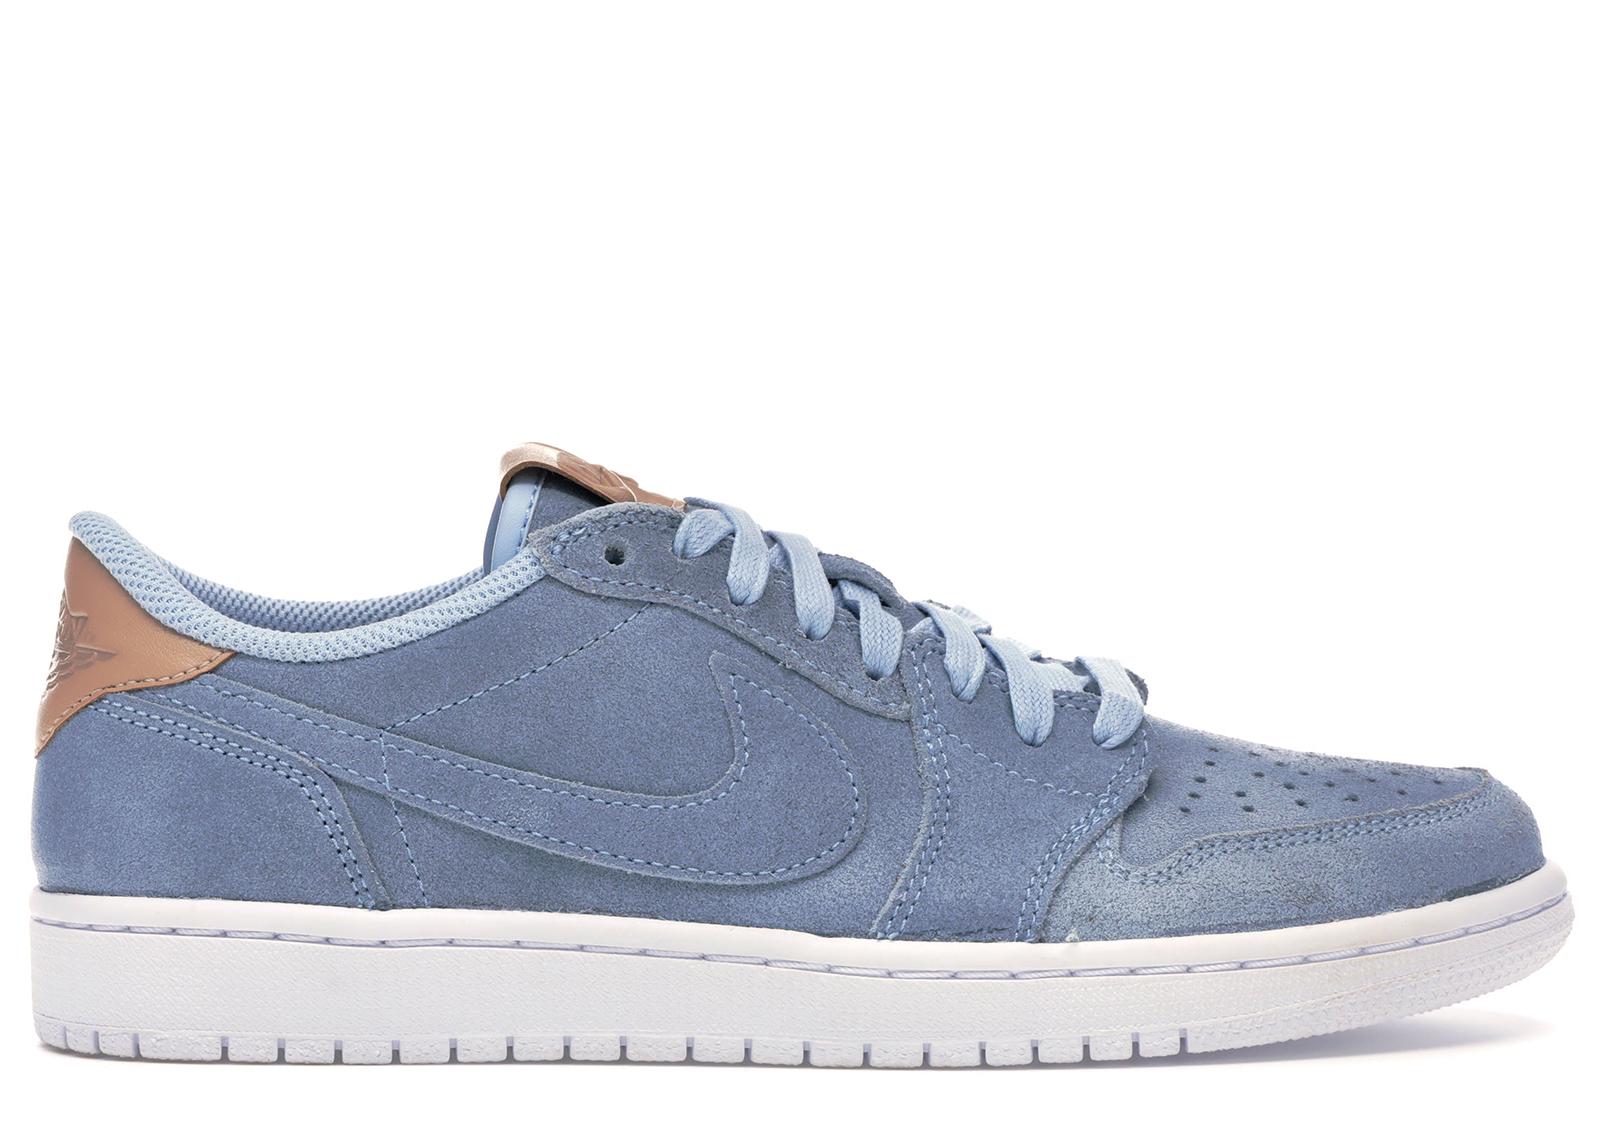 Jordan 1 Retro Low OG Ice Blue - 905136-402